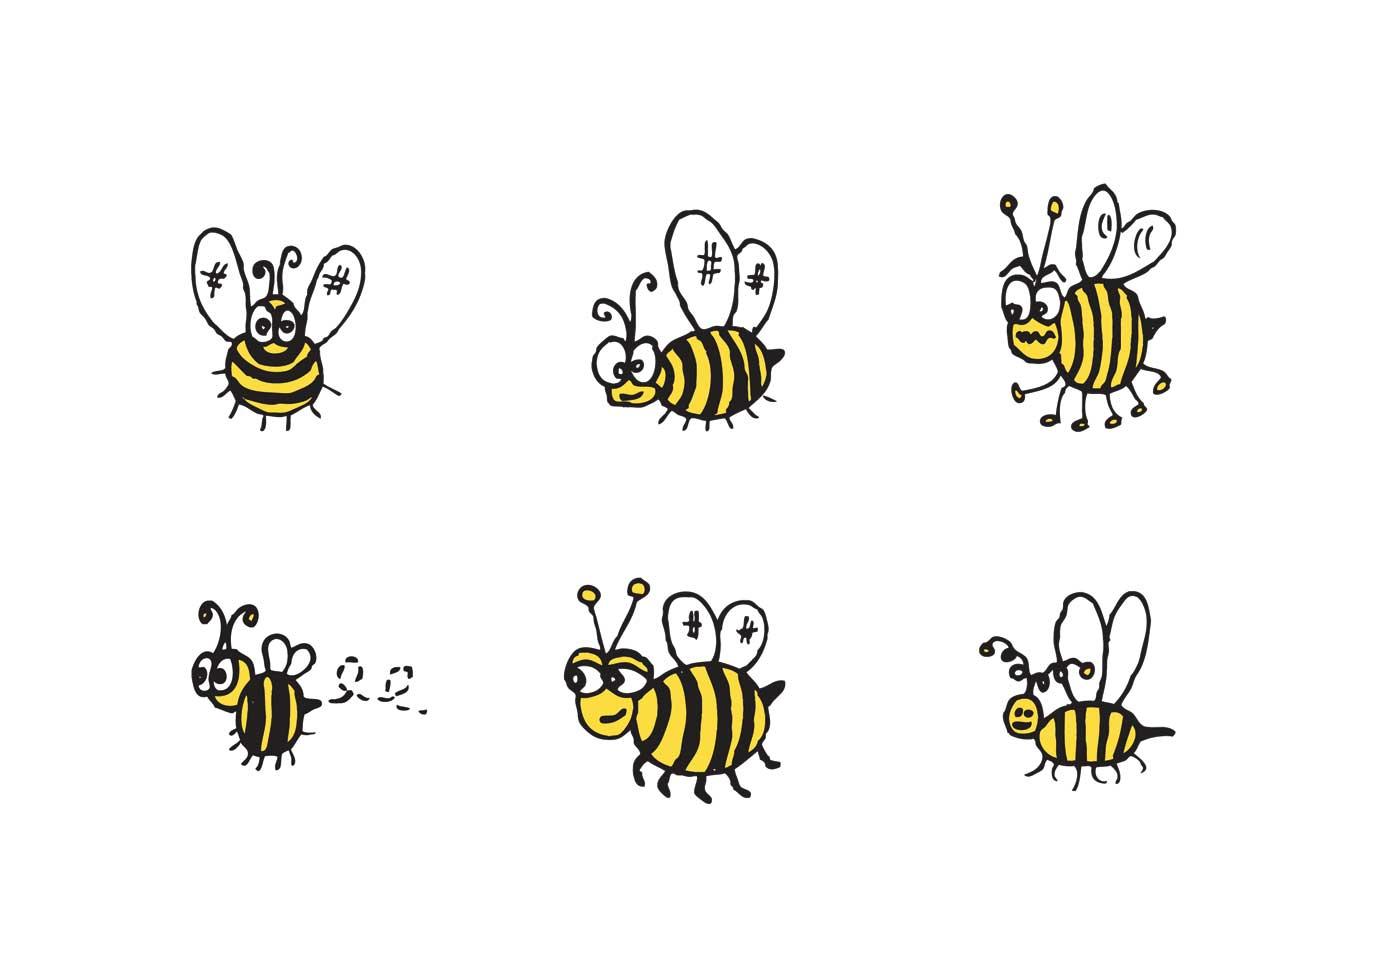 Vartmaan Cartoon Serial - Freelance Graphic Designer